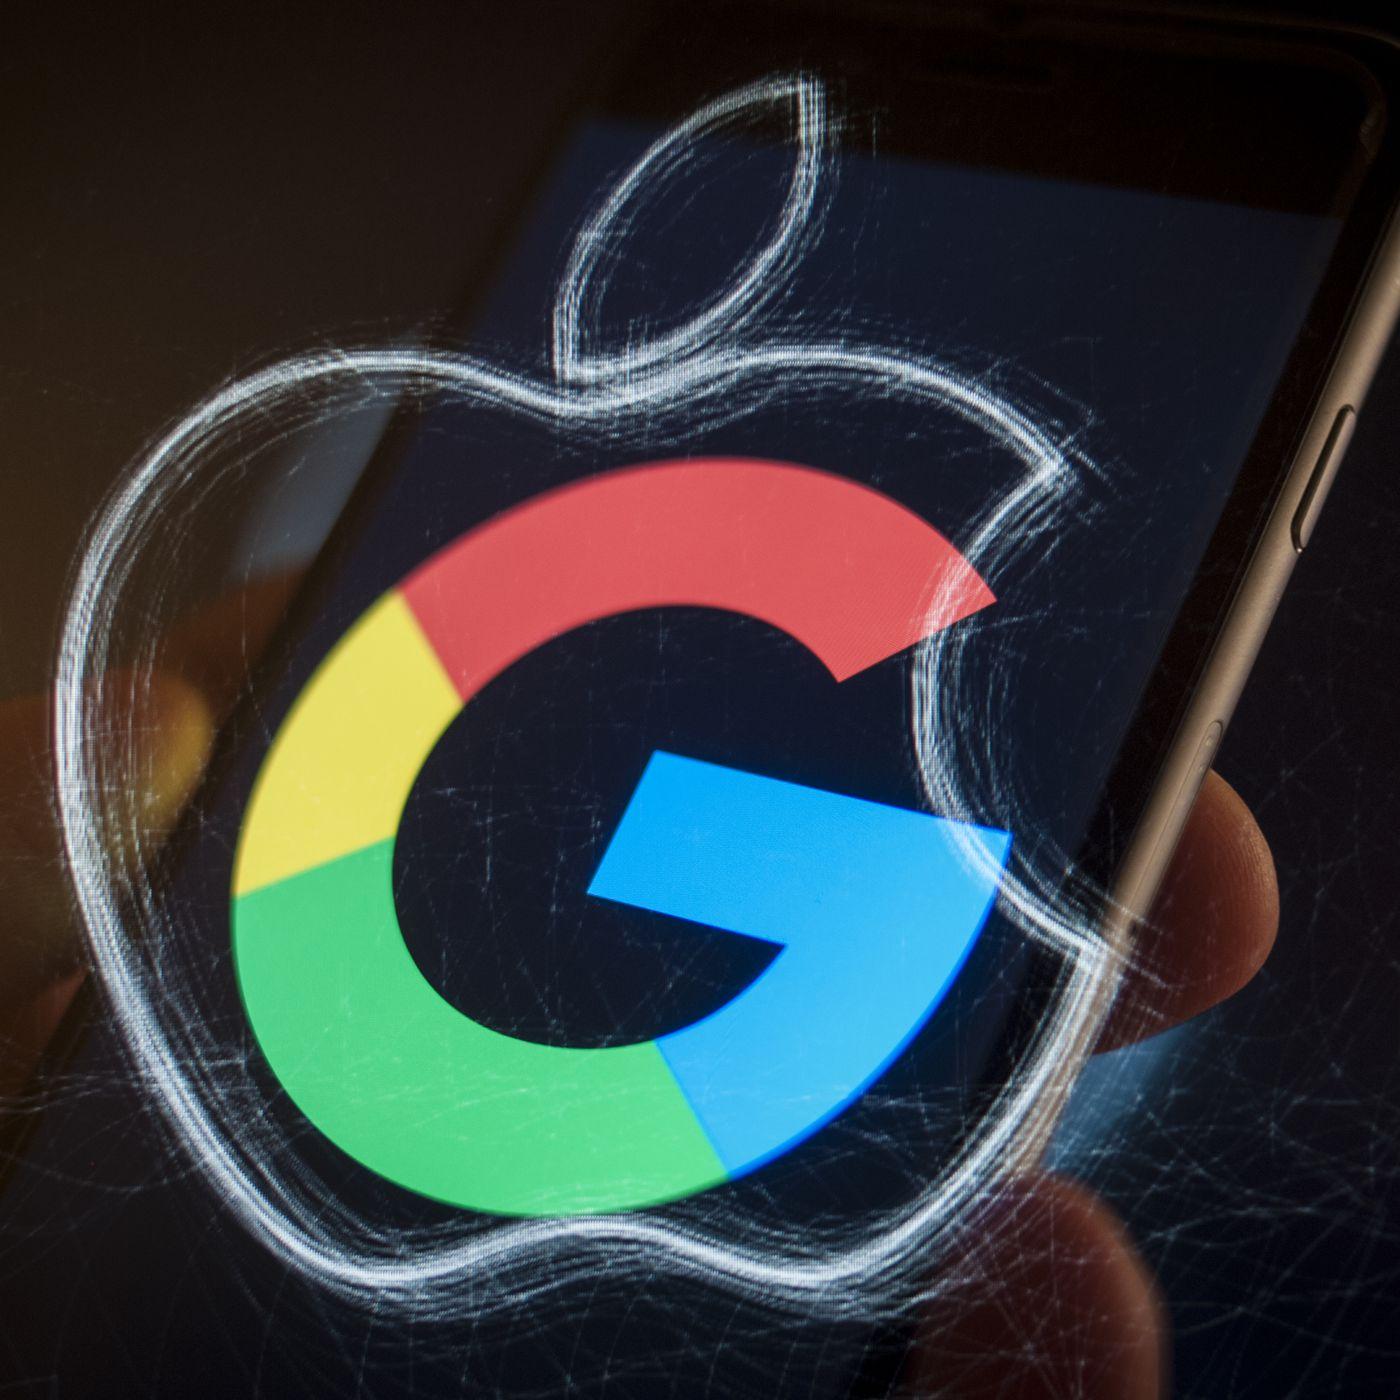 Apple And Google Will Make Tracking Technology To Fight Coronavirus Vox